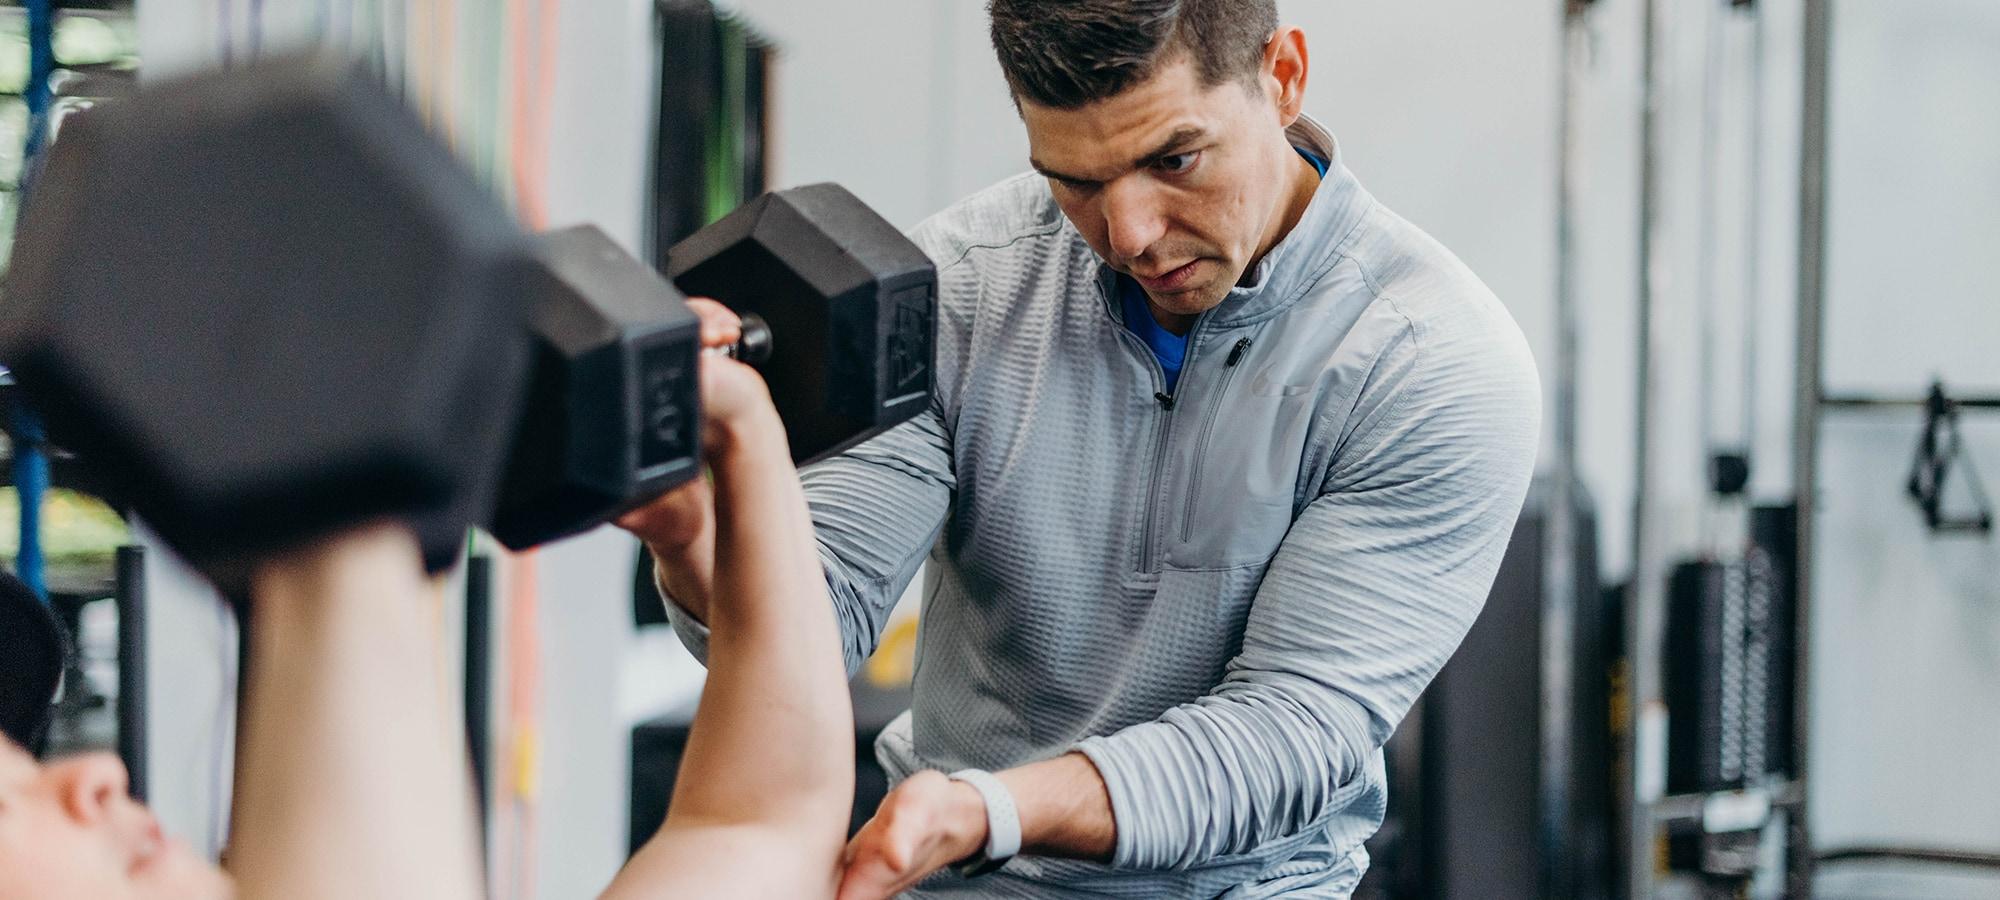 Sean Ferguson assisting man in bicep exercise